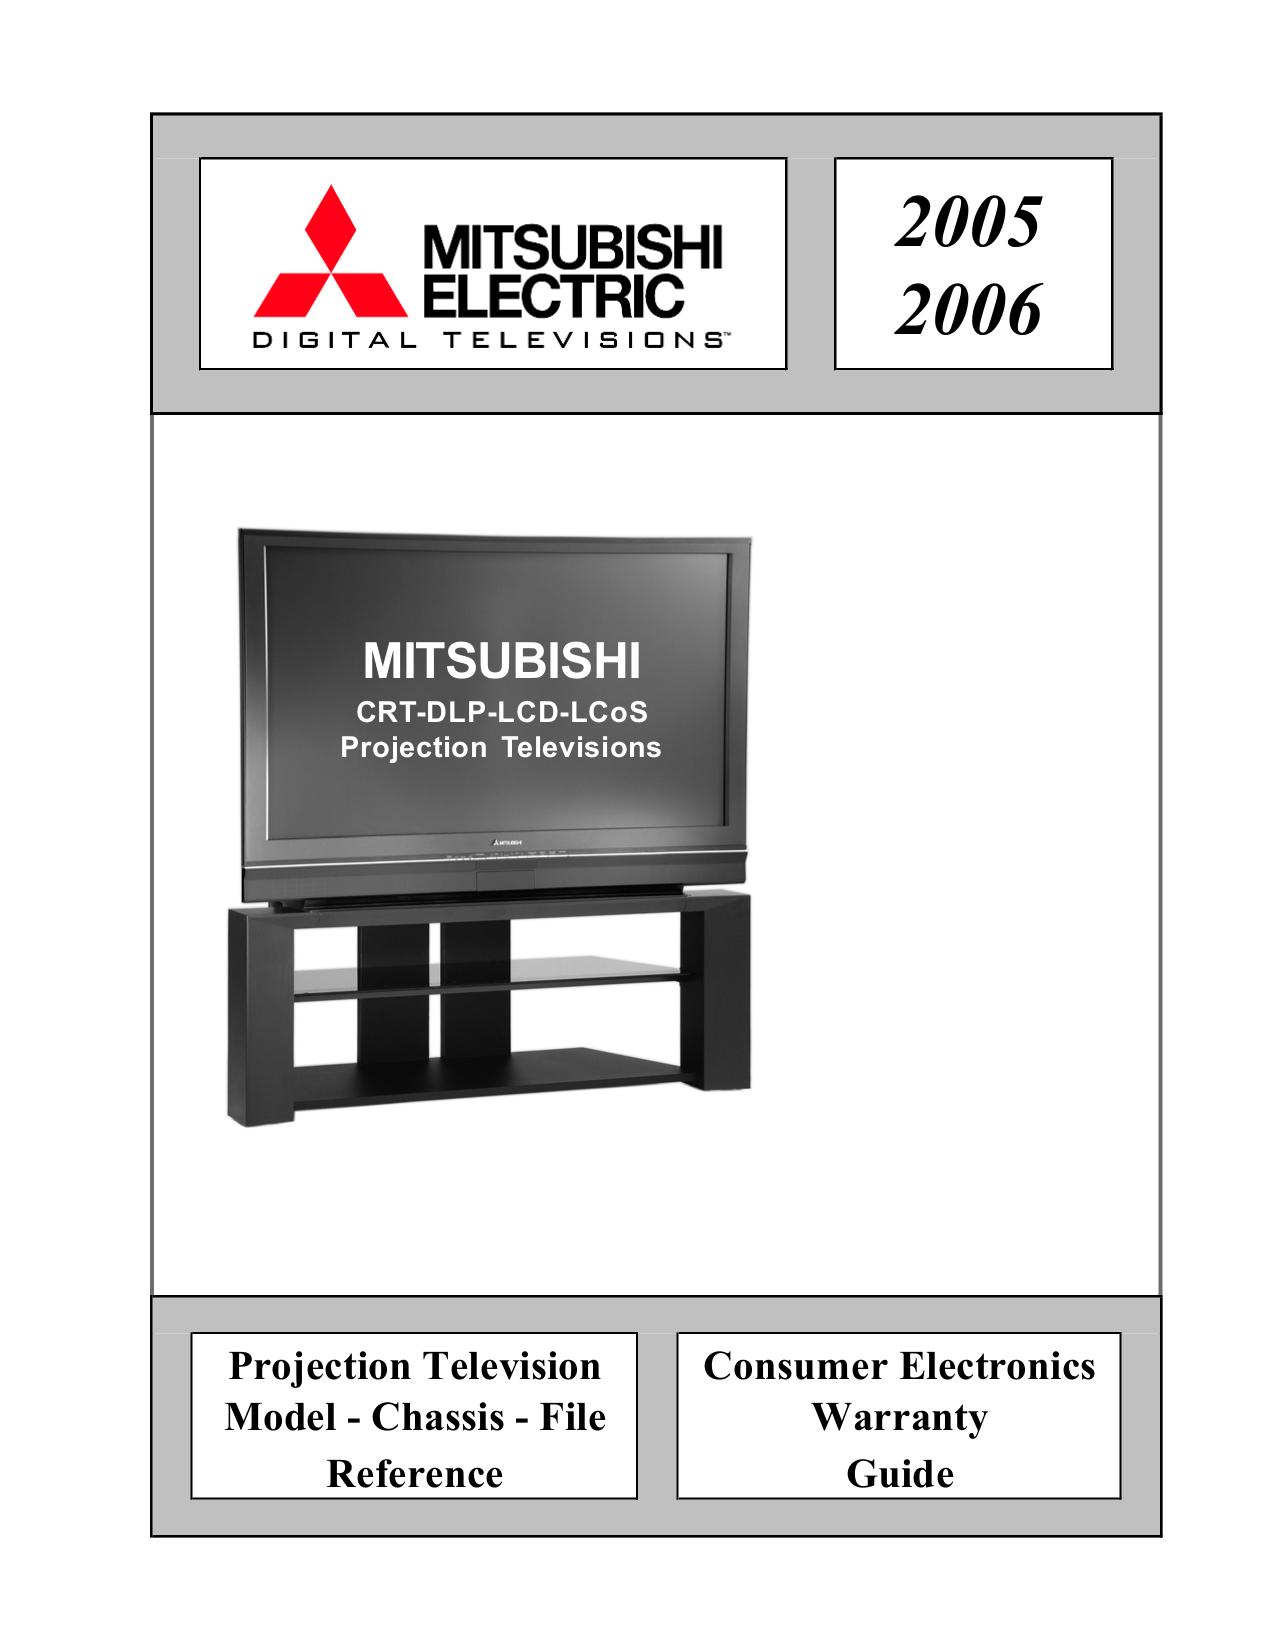 mitsubishi ws 48313 manual how to and user guide instructions u2022 rh taxibermuda co Mitsubishi Ex Mitsubishi ASX